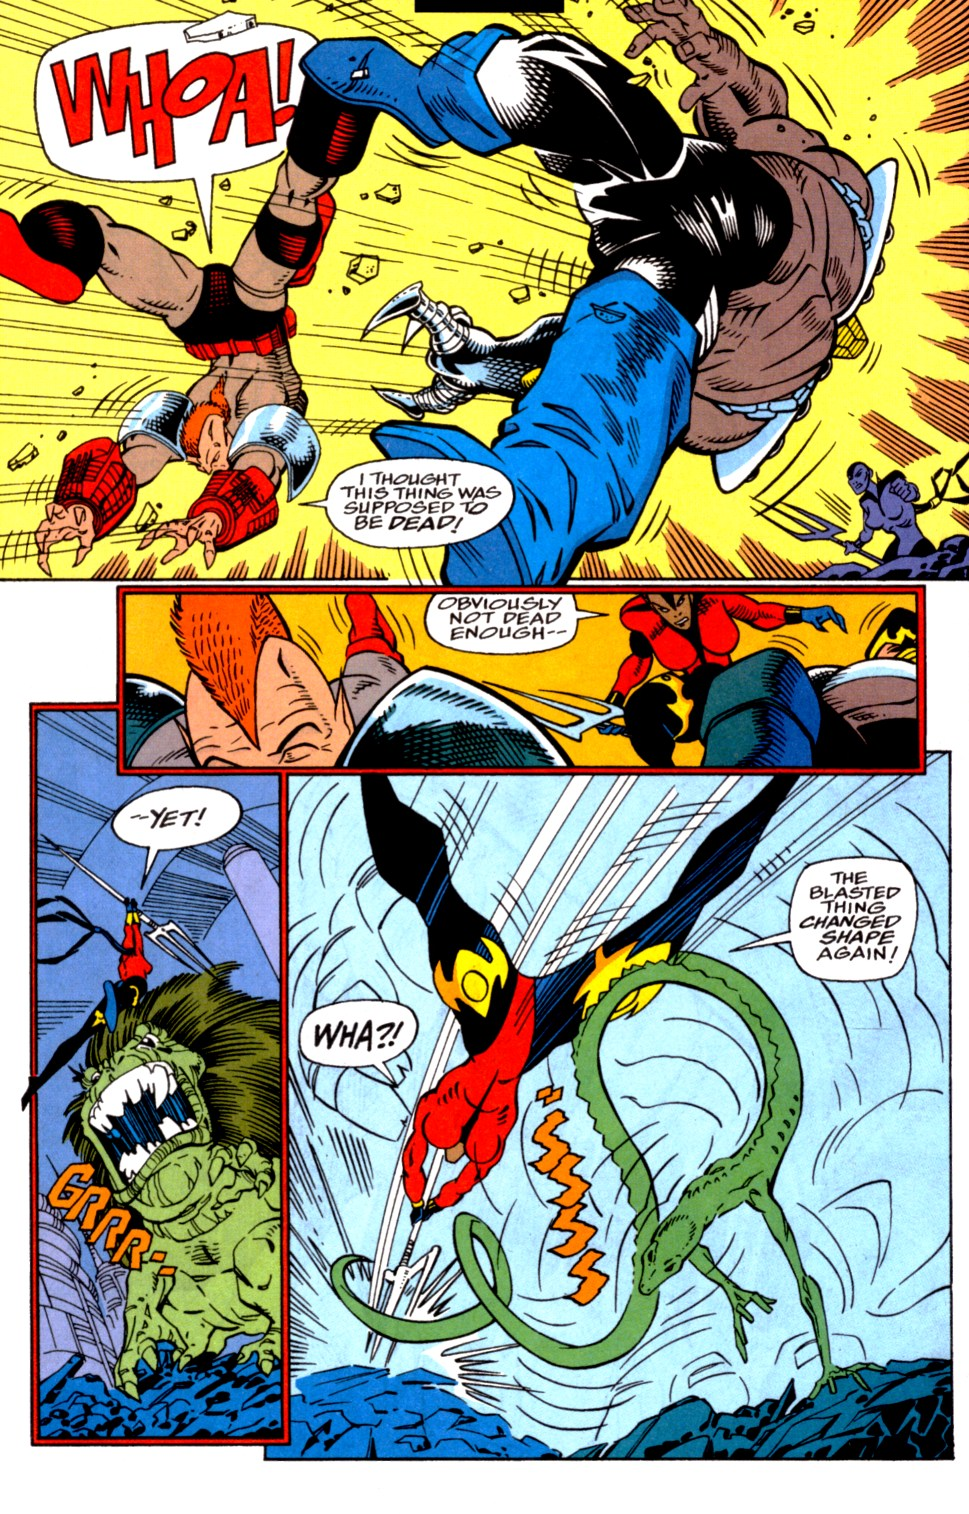 Read online Blackwulf comic -  Issue #4 - 13